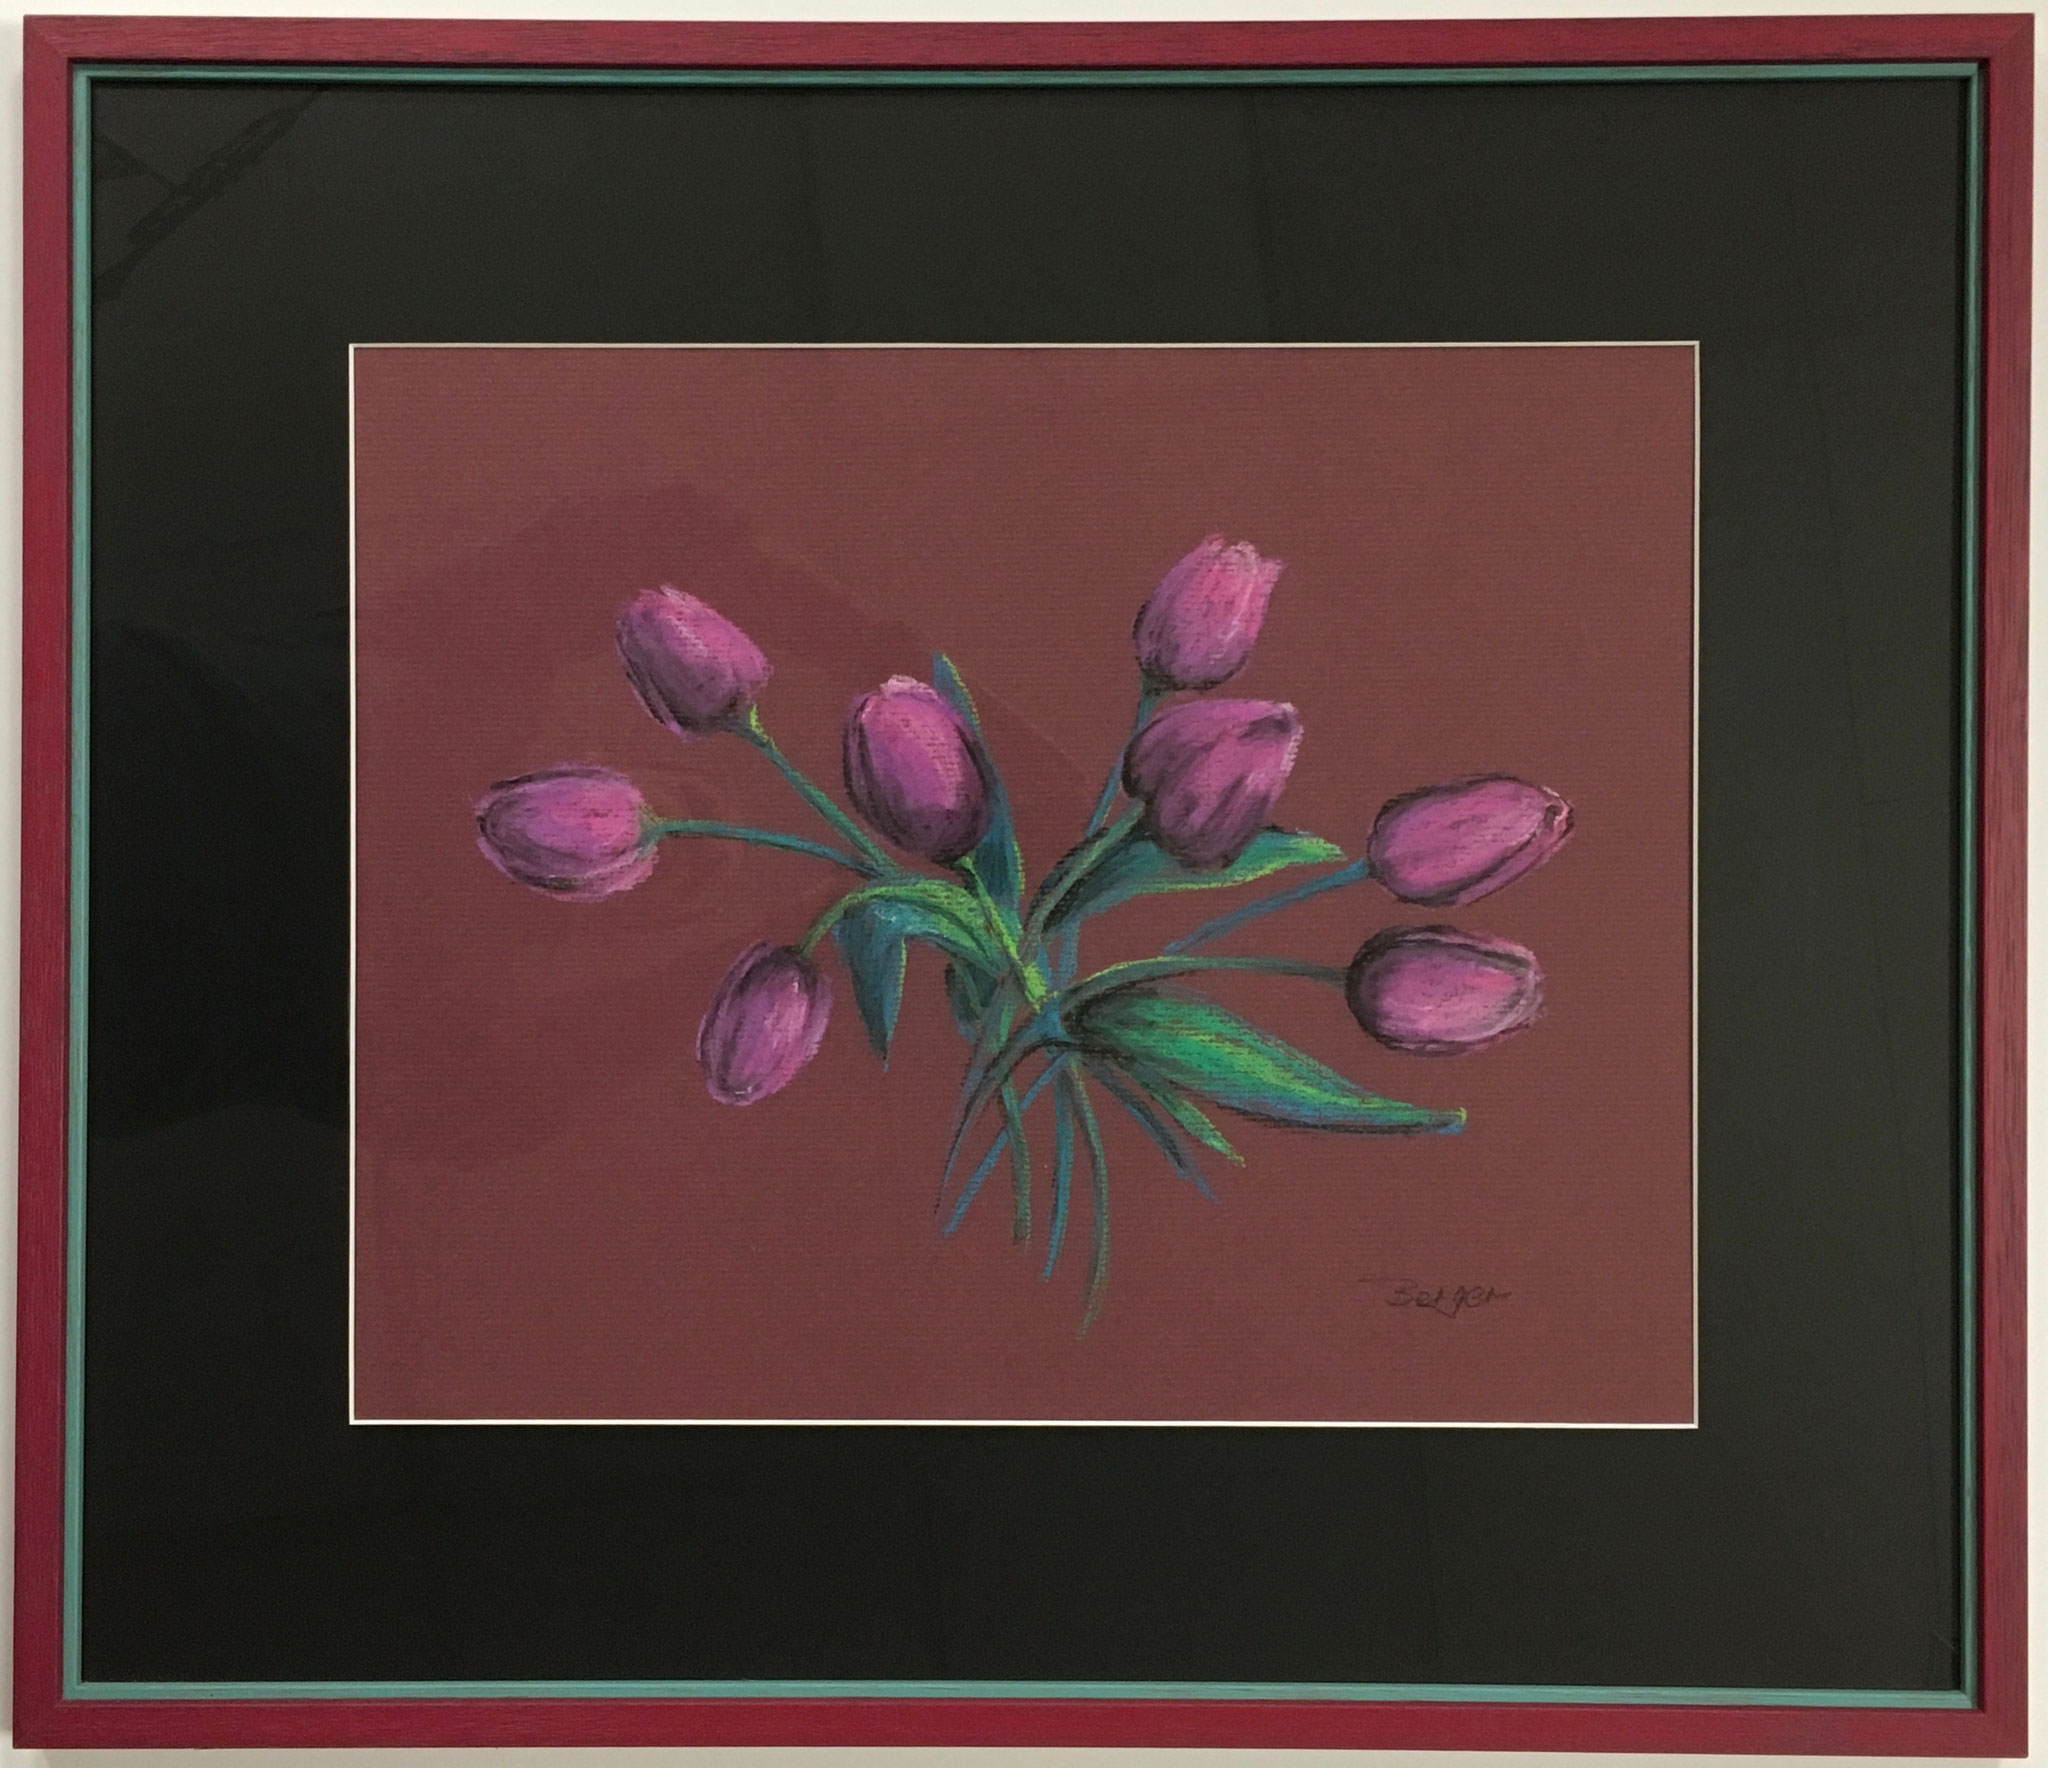 "Gisela Berger ""Tulpen"" Größe/Falzmaß 70,0 x 60,0cm mit Passepartout in Doppelrahmen gerahmt €449,-"